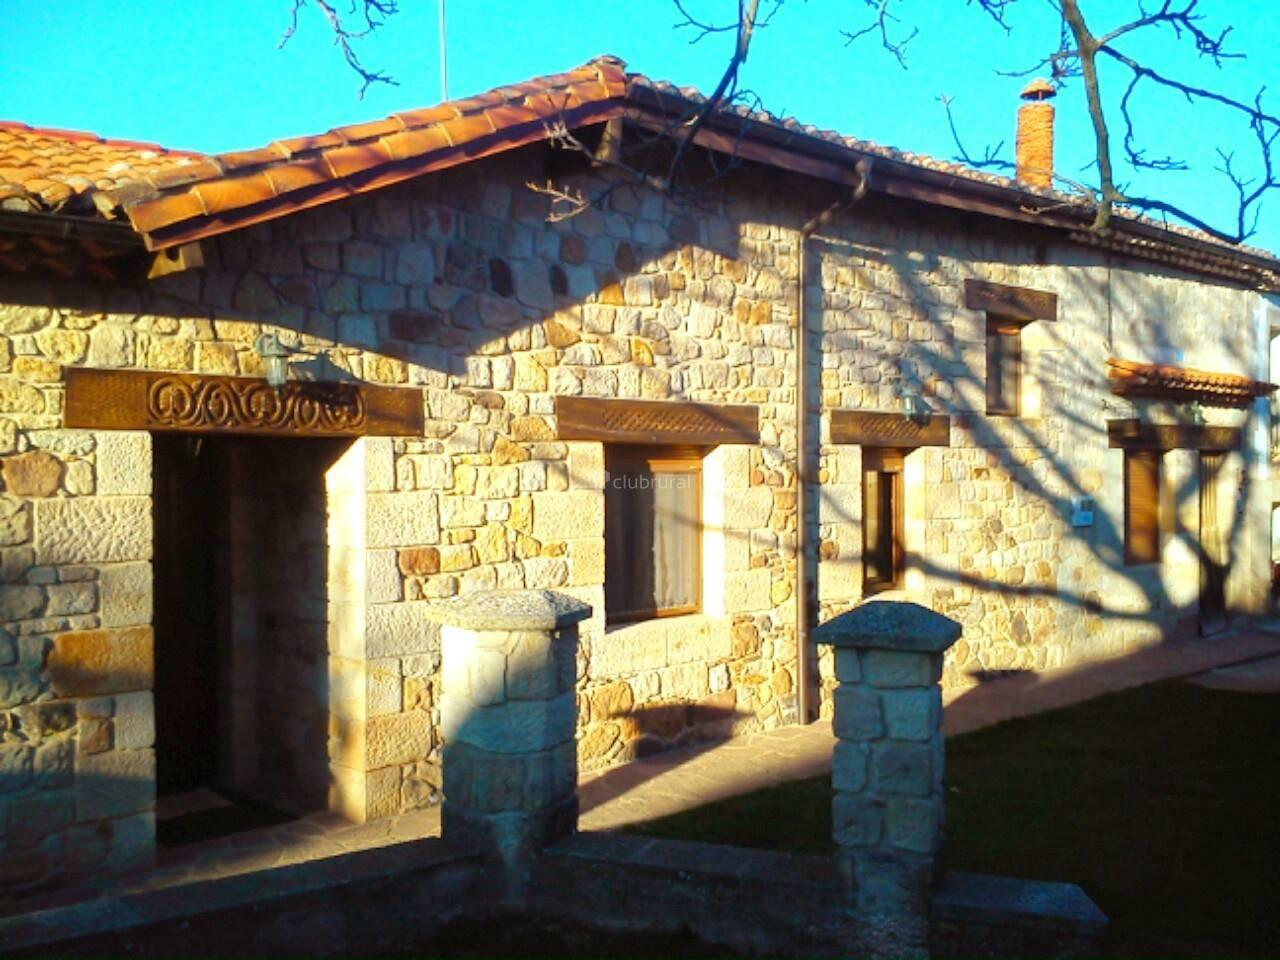 Fotos de la chimenea serrana burgos hacinas clubrural - La casa de la chimenea ...